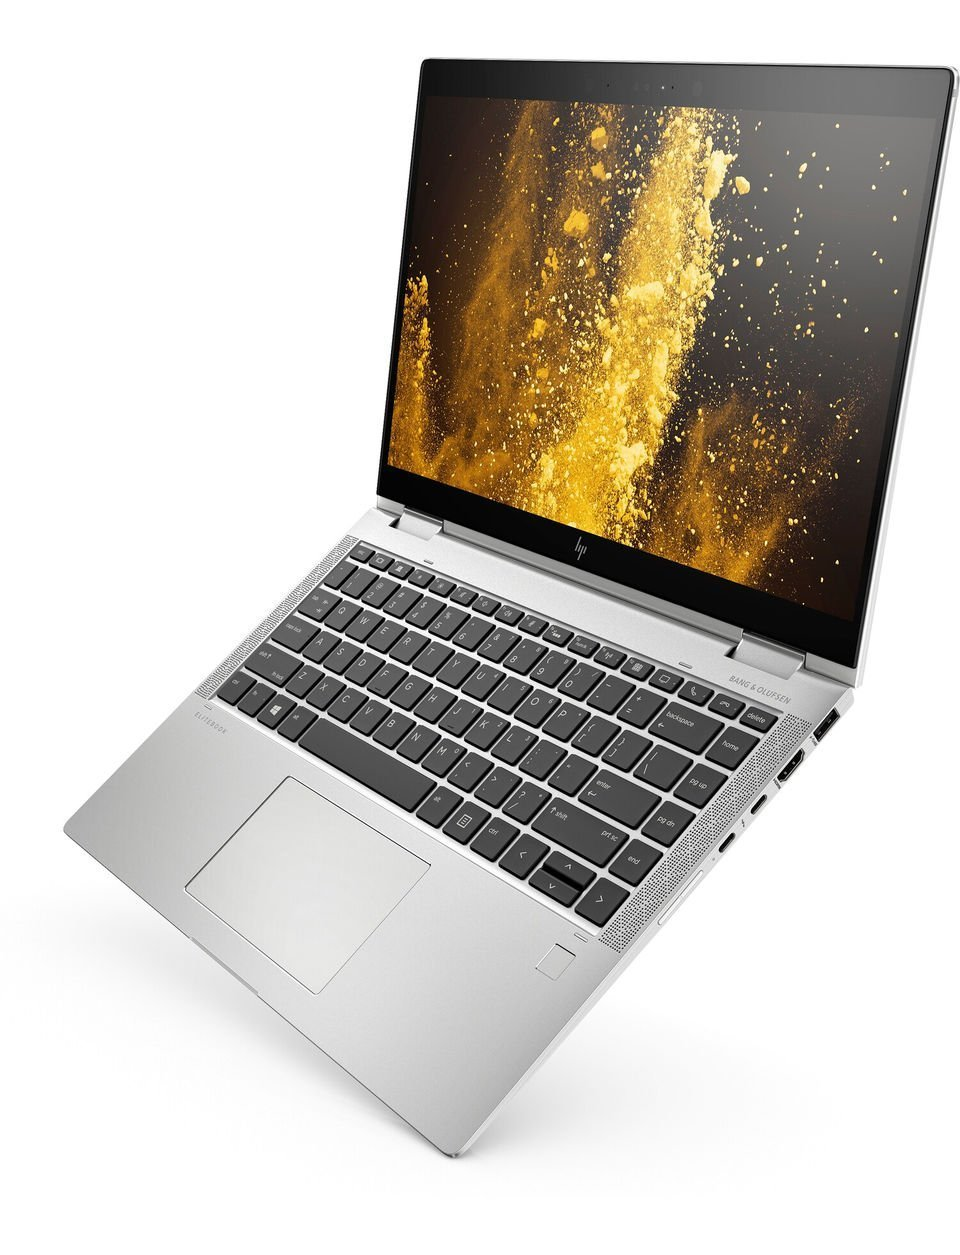 HP Elitebook g5 1040 resize